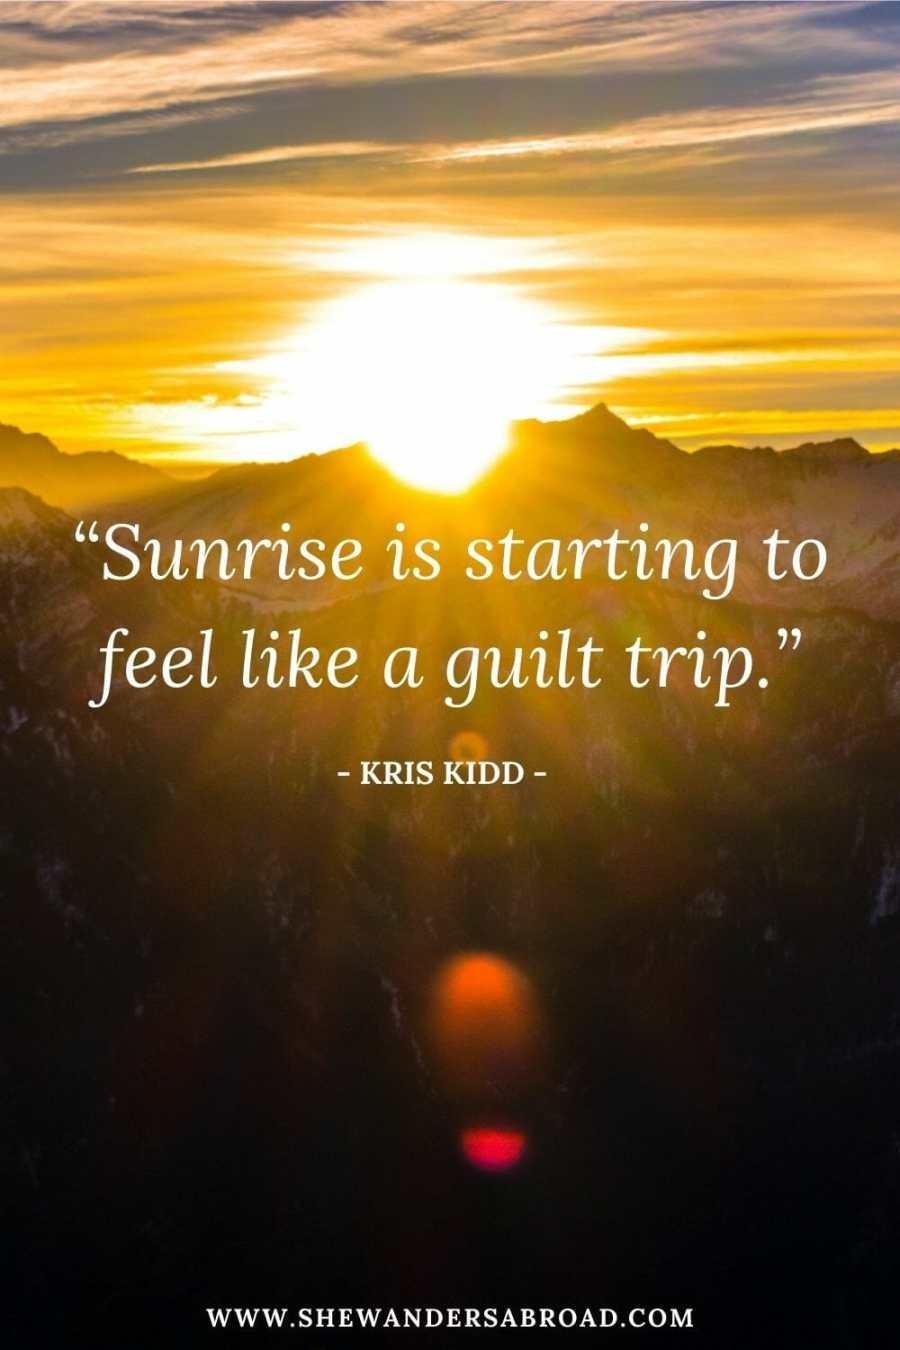 Funny sunrise captions for Instagram